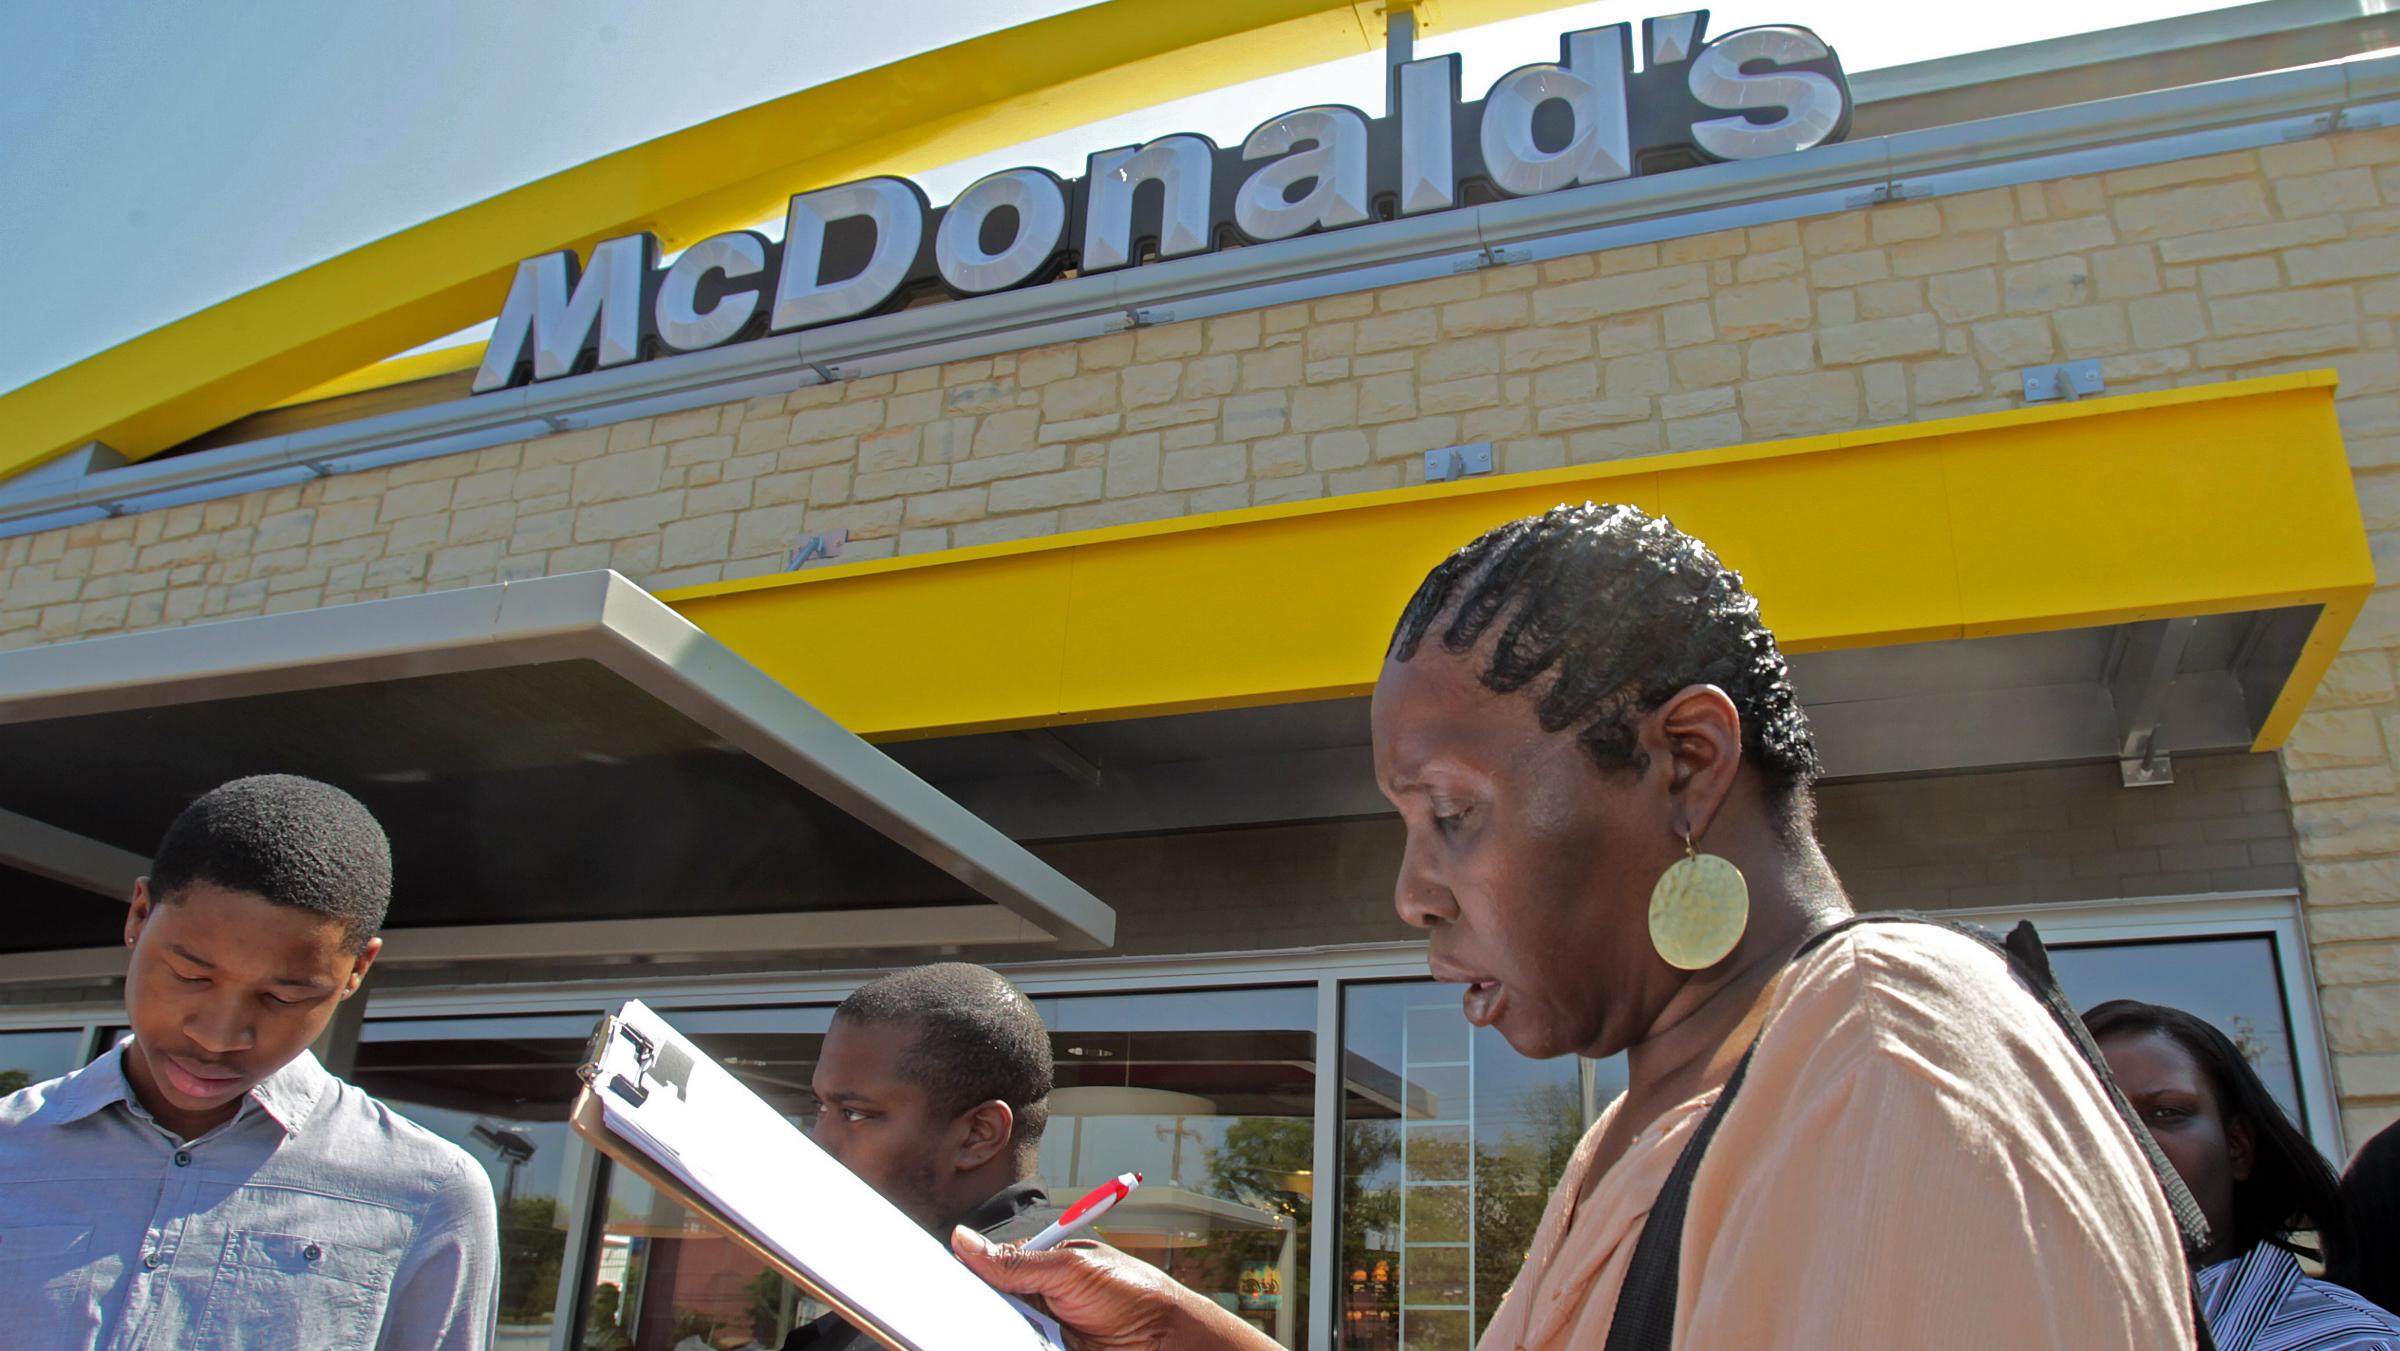 Rosaland Hemphill, 48, of Atlanta, fills out a job application at an Atlanta McDonald's restaurant Tuesday, April 19, 2011. McDonald's hopes to hire 50,000 new workers nationwide on April 19, 2011. (AP Photo/John Bazemore